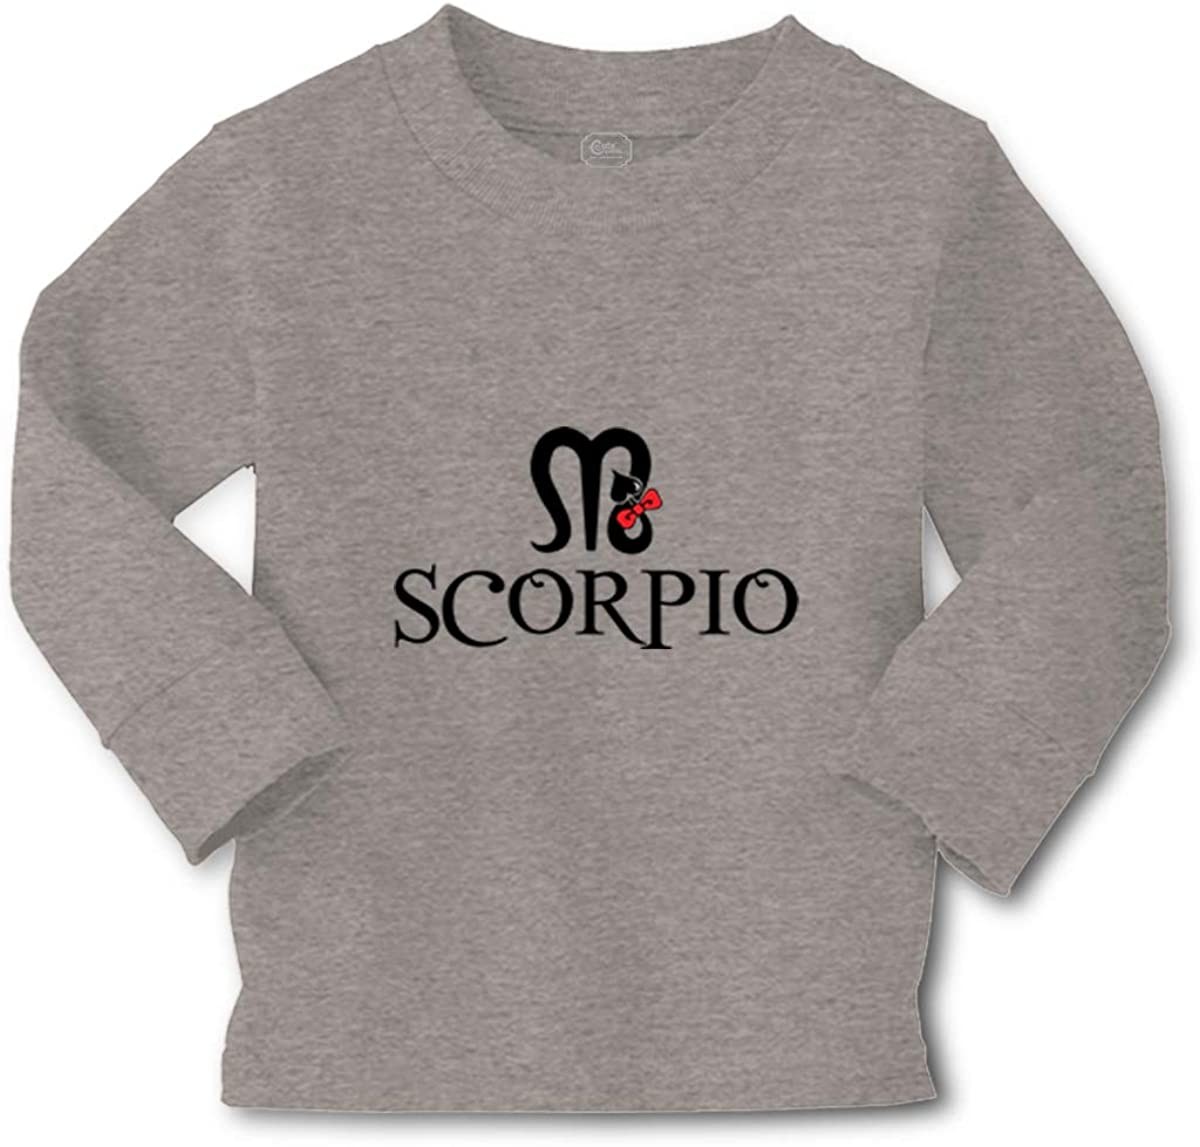 Kids Long Sleeve T Shirt Scorpio Zodiac Sign Cotton Boy & Girl Clothes